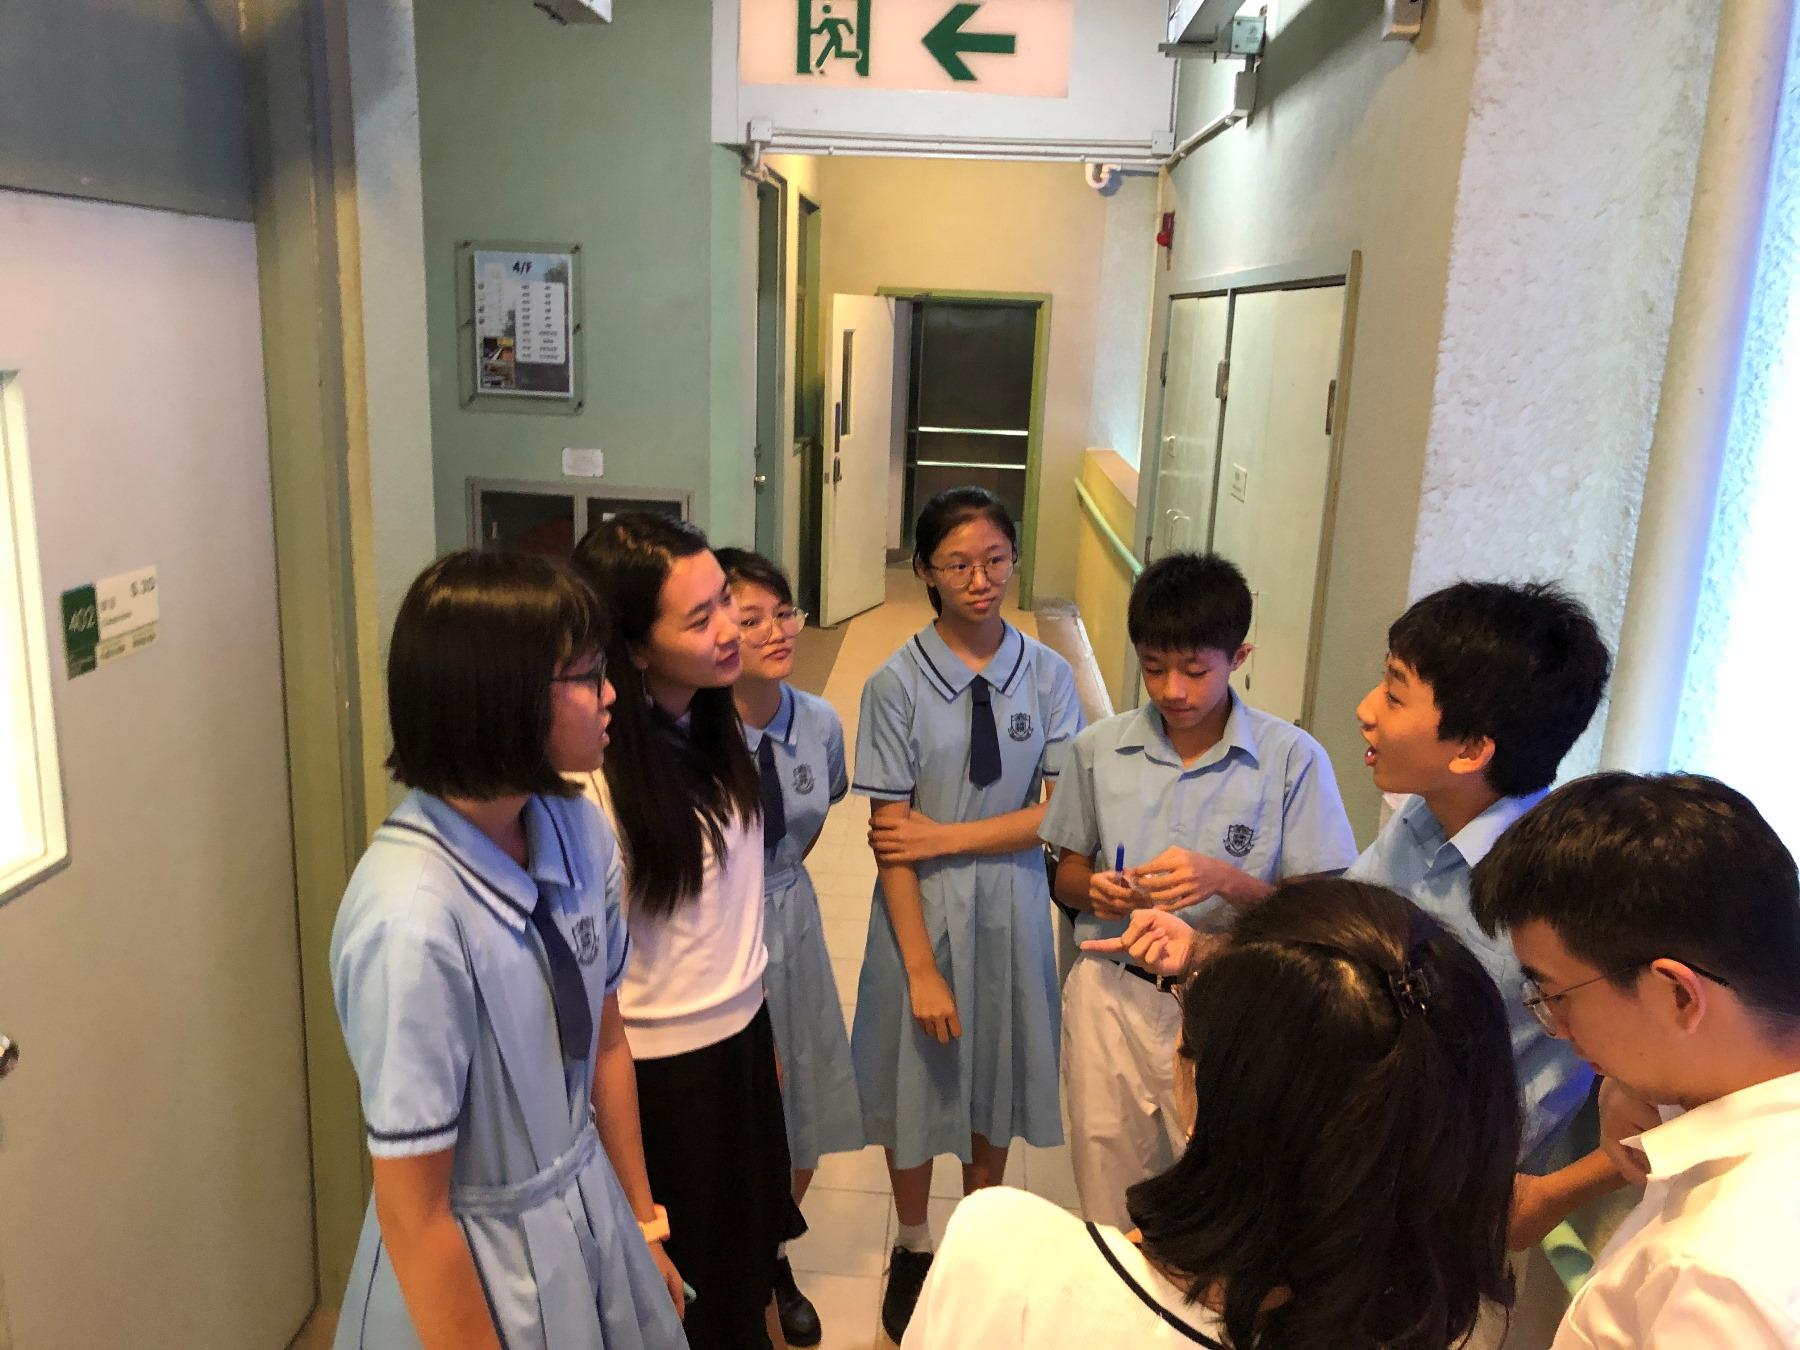 https://npc.edu.hk/sites/default/files/img_7267_1.jpg